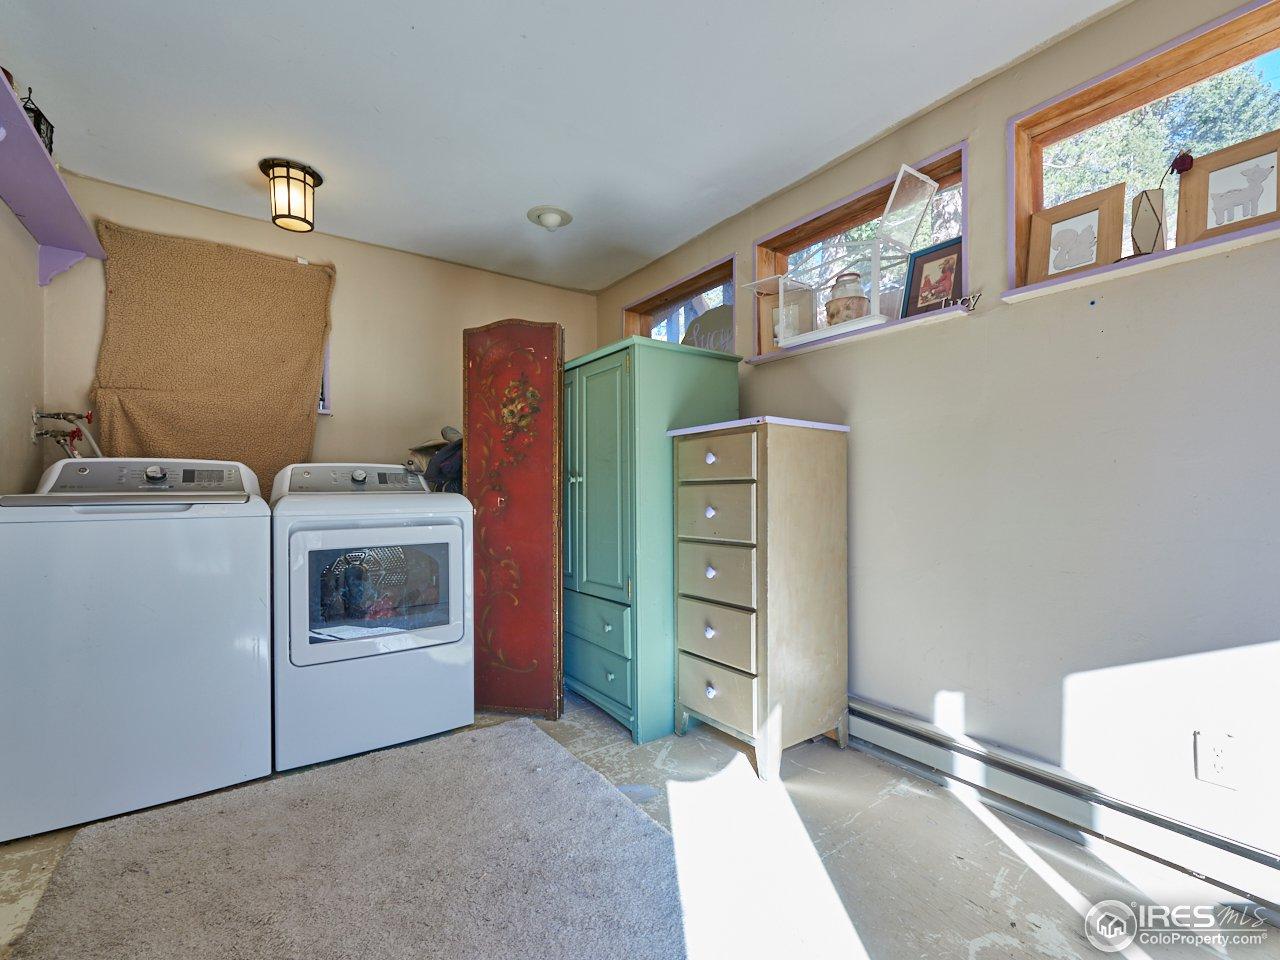 Bedroom/laundry room